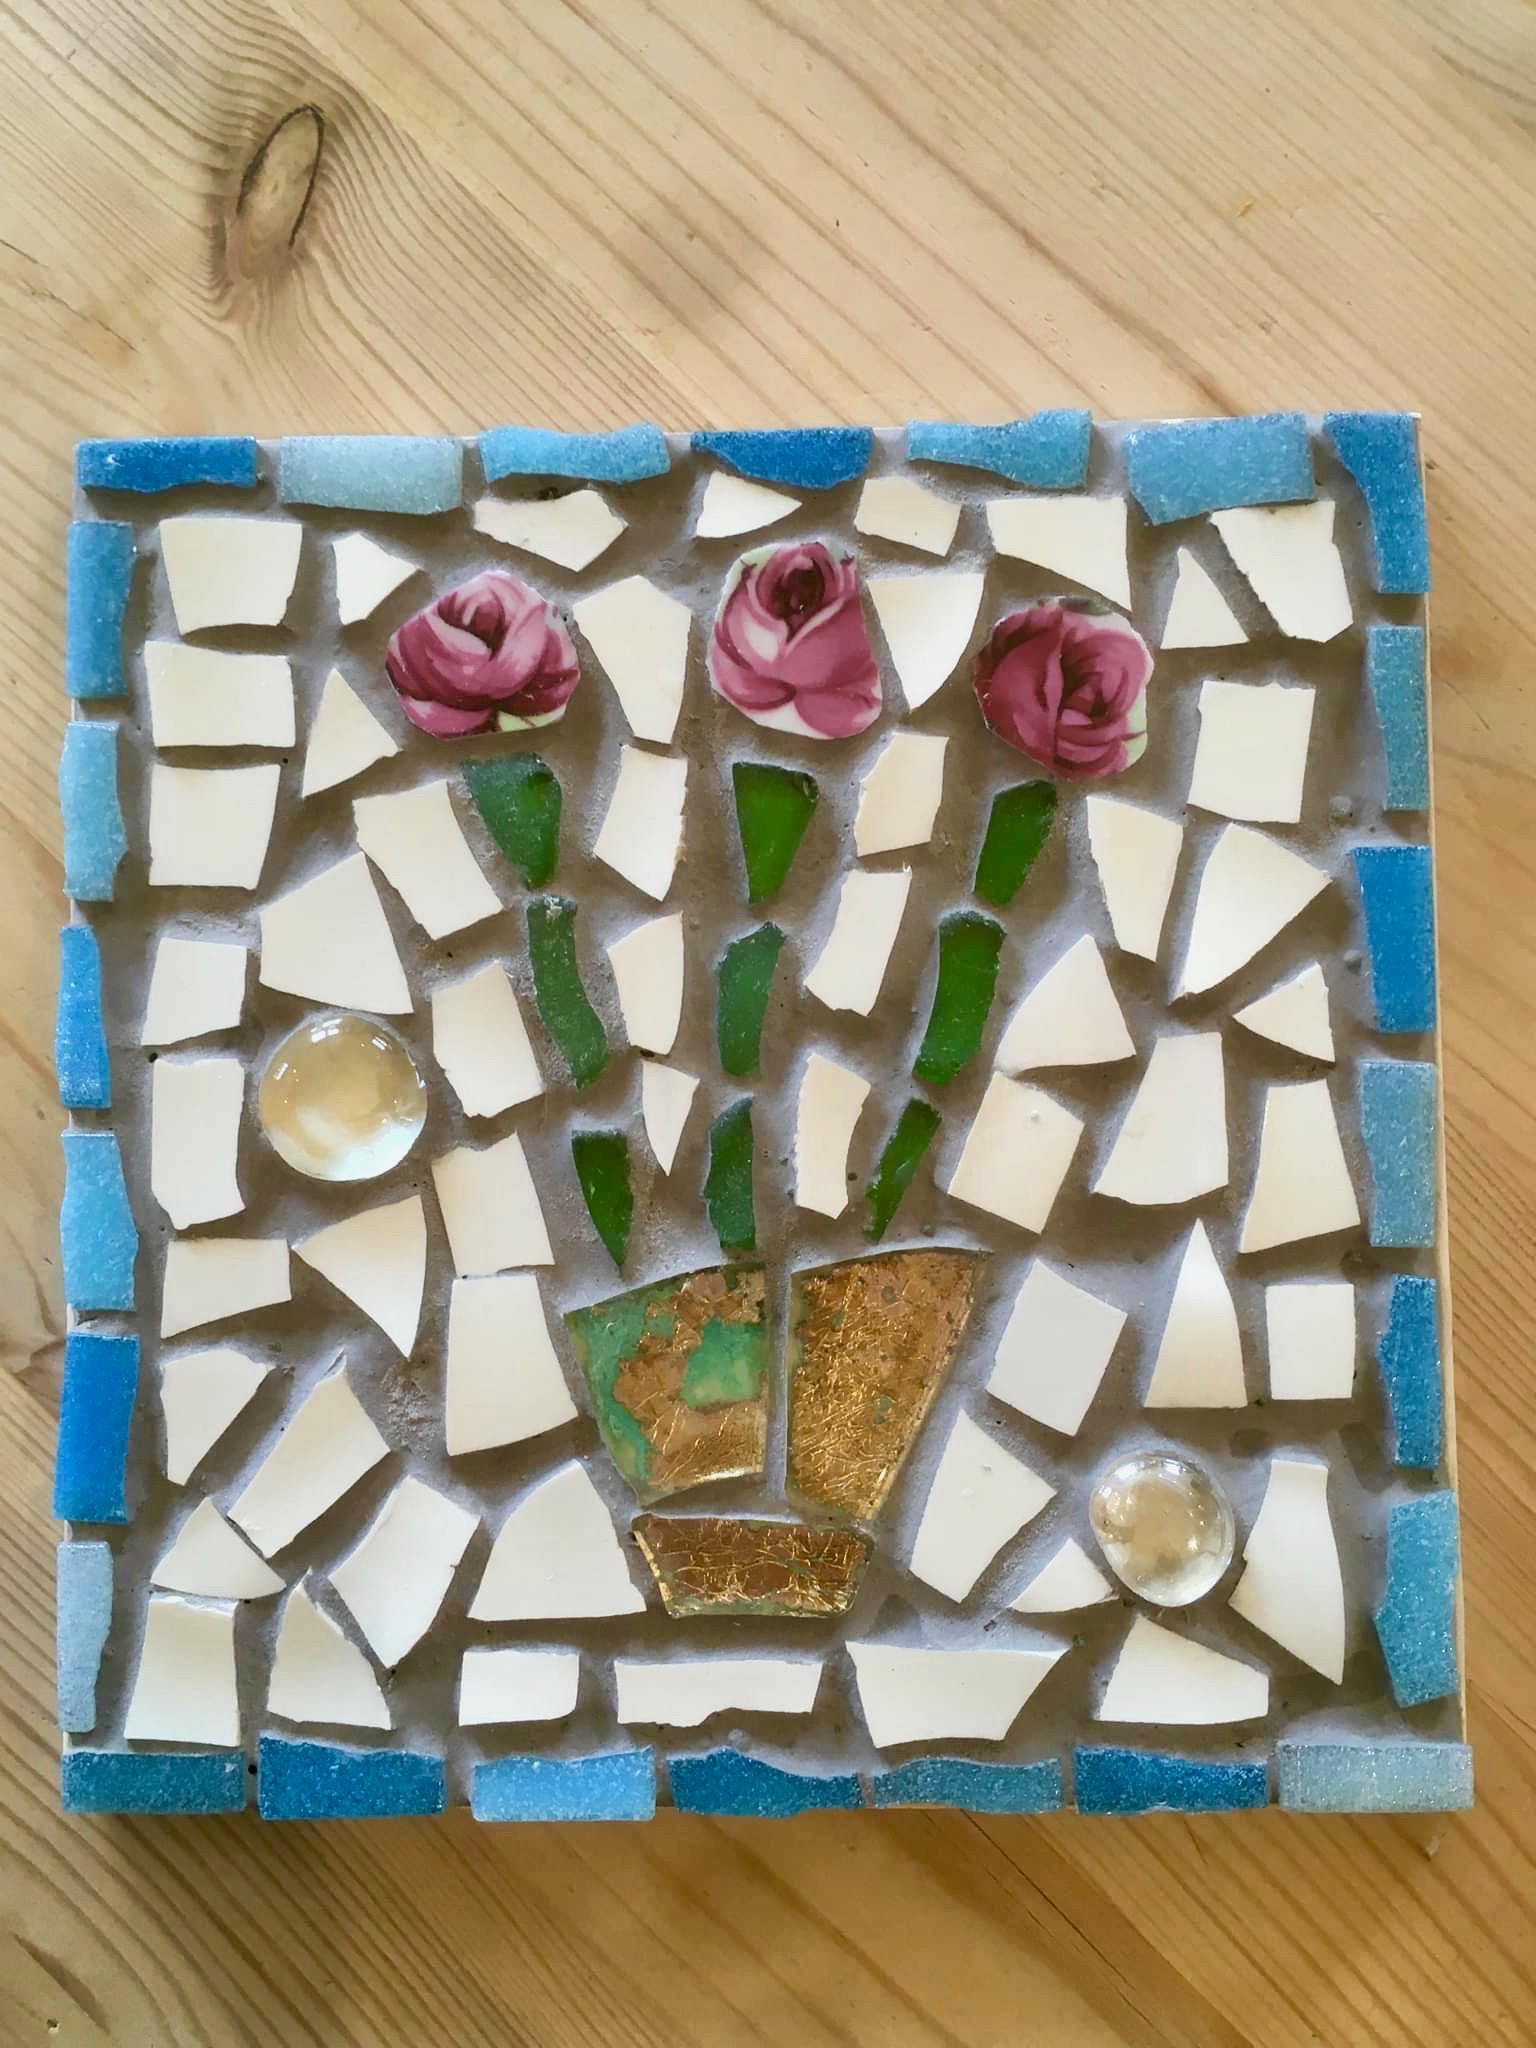 mosaic,tile,vintage,china,ceramics,crockery,repurpose